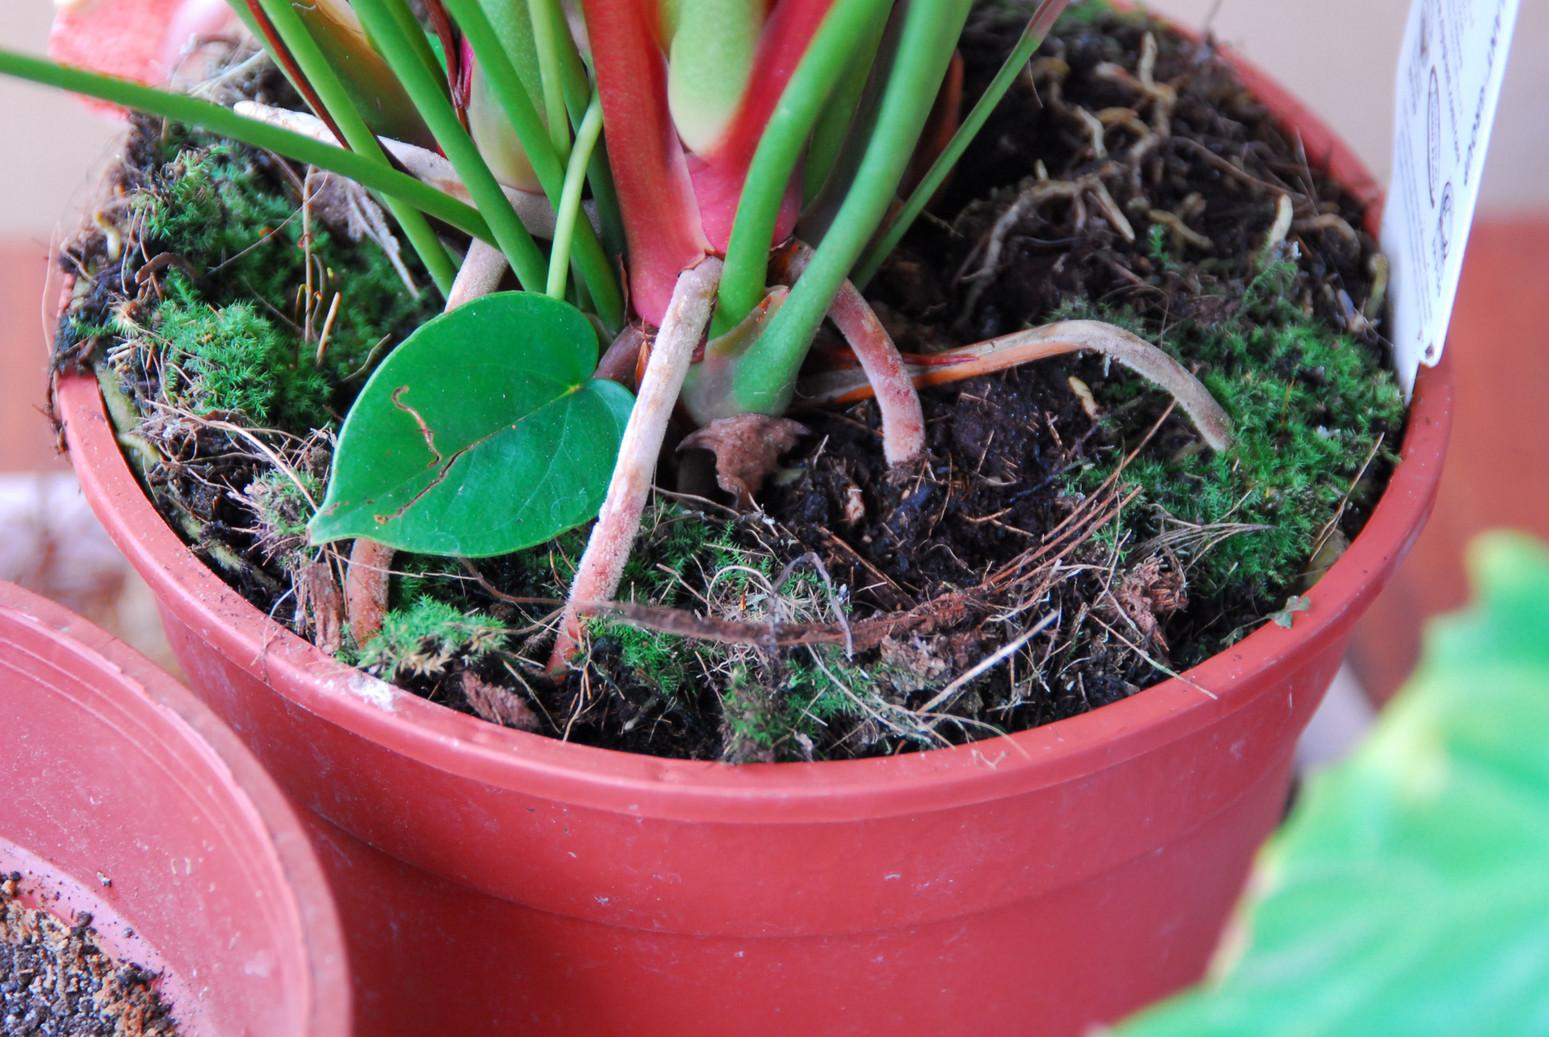 Уход и выращивание антуриума в домашних условиях